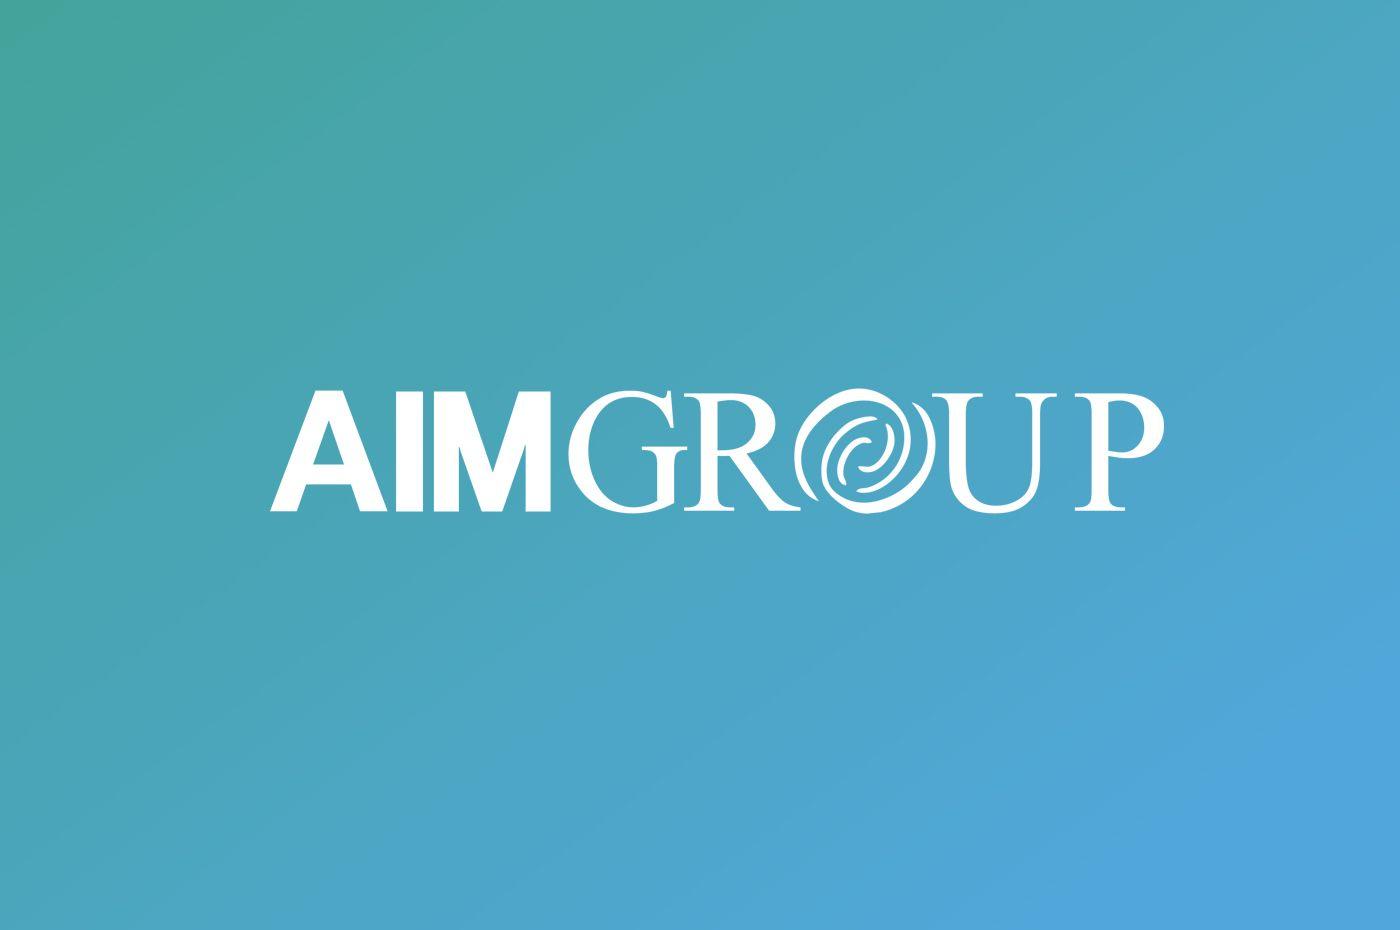 Job.com earmarks $1.2 million for Company.com partnership